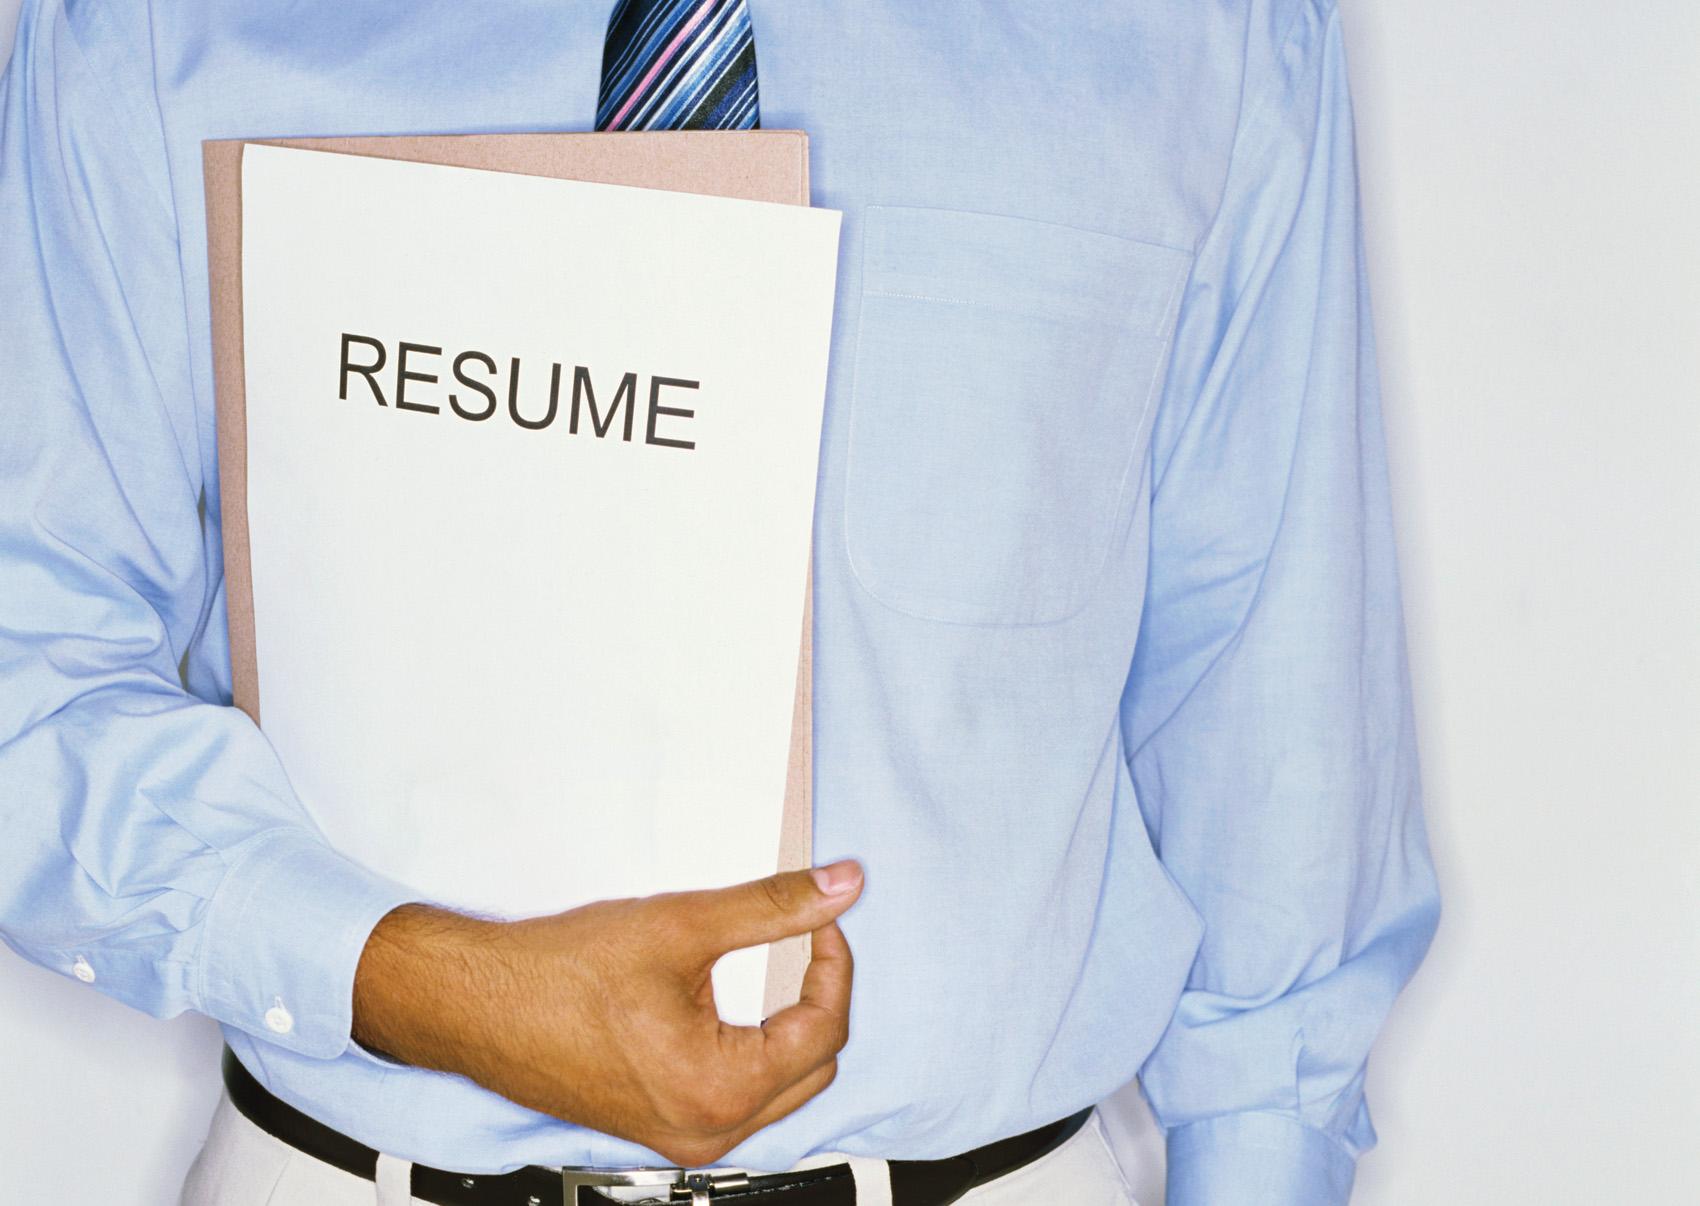 Unemployment in Bulgaria in June 2018 was 4.8% – Eurostat